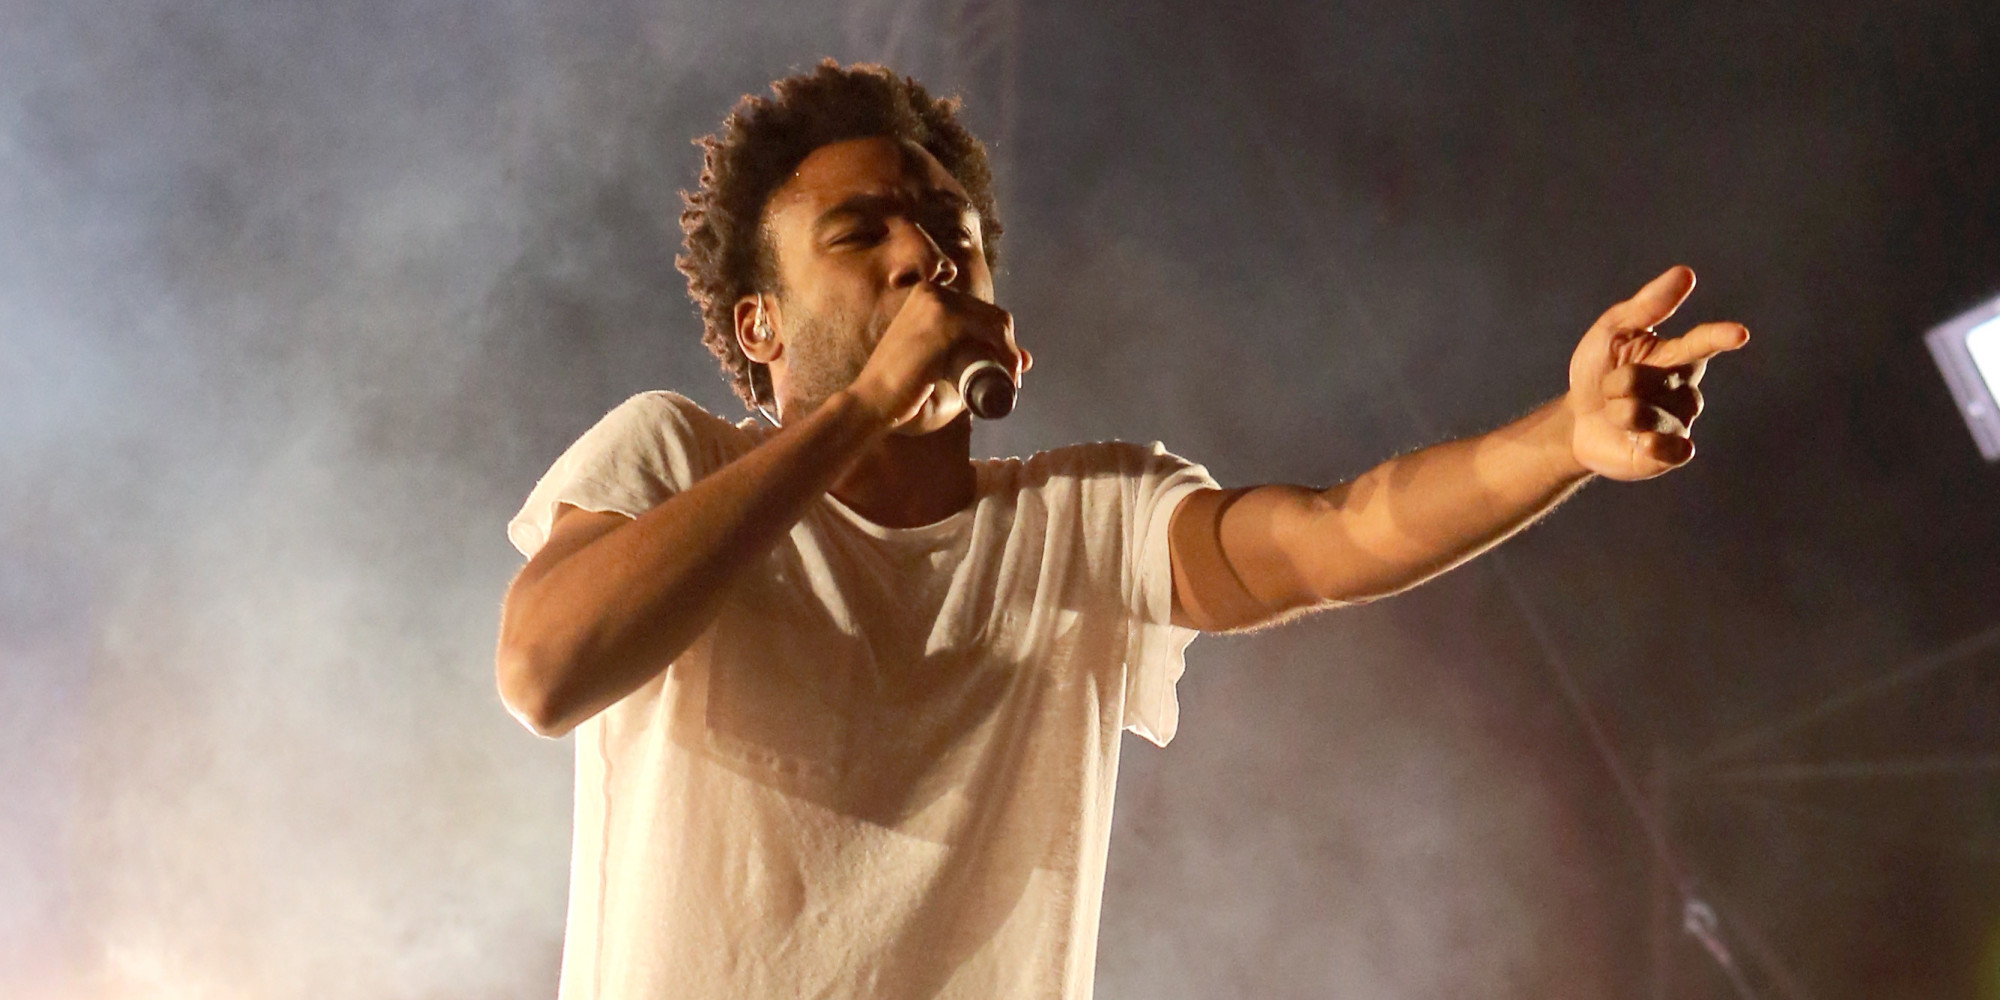 Childish Gambino Calls Out Drake, Kendrick Lamar & Schoolboy Q